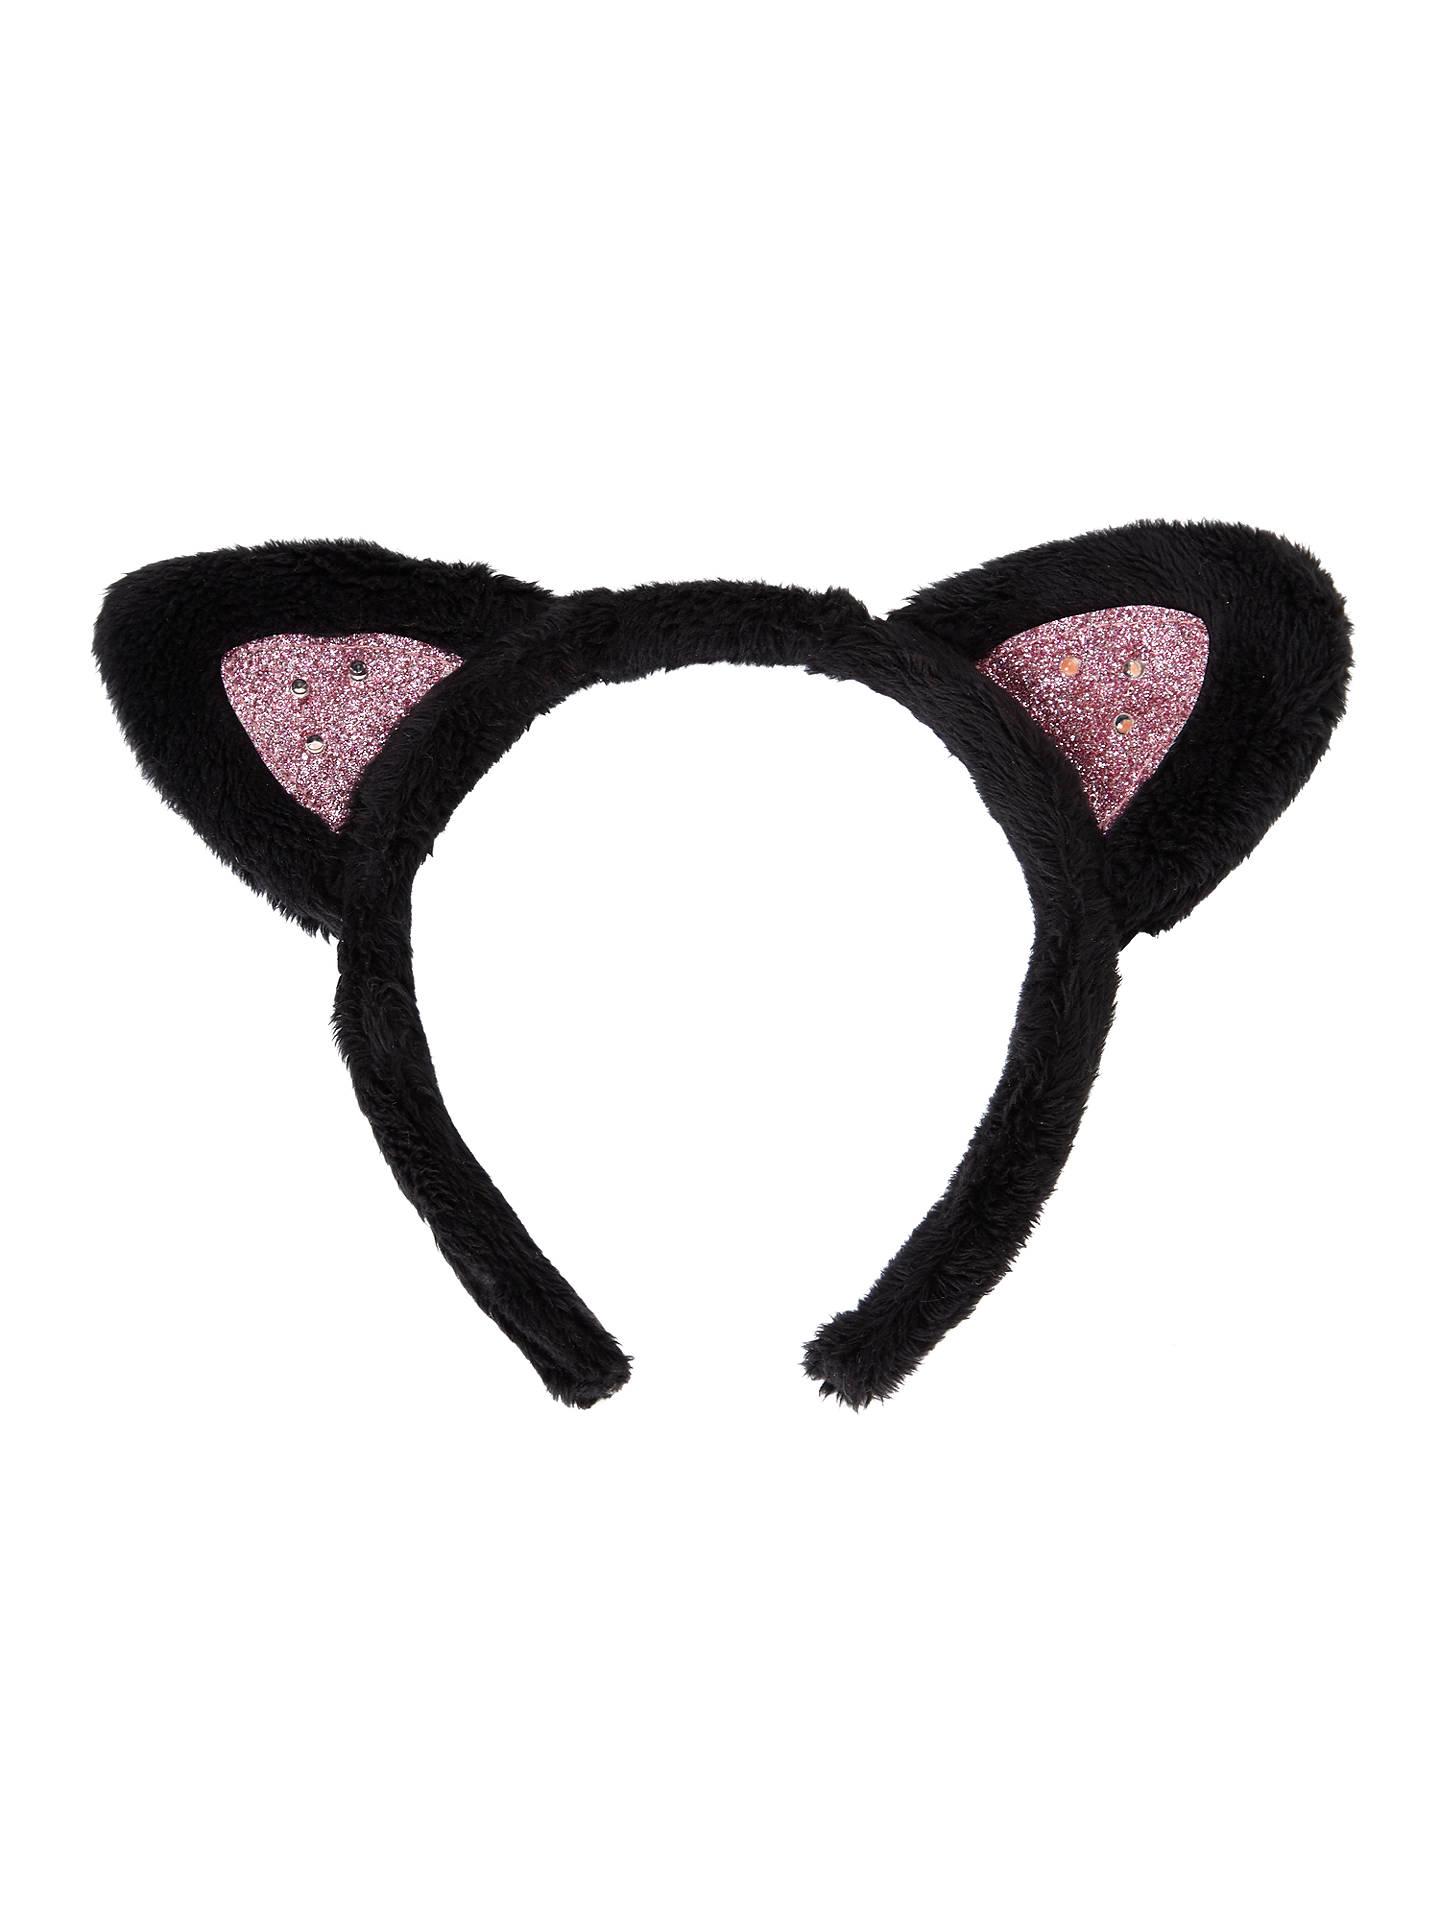 db1ab90b116 Buy John Lewis Children s Halloween Light Up Cat Ears Headband